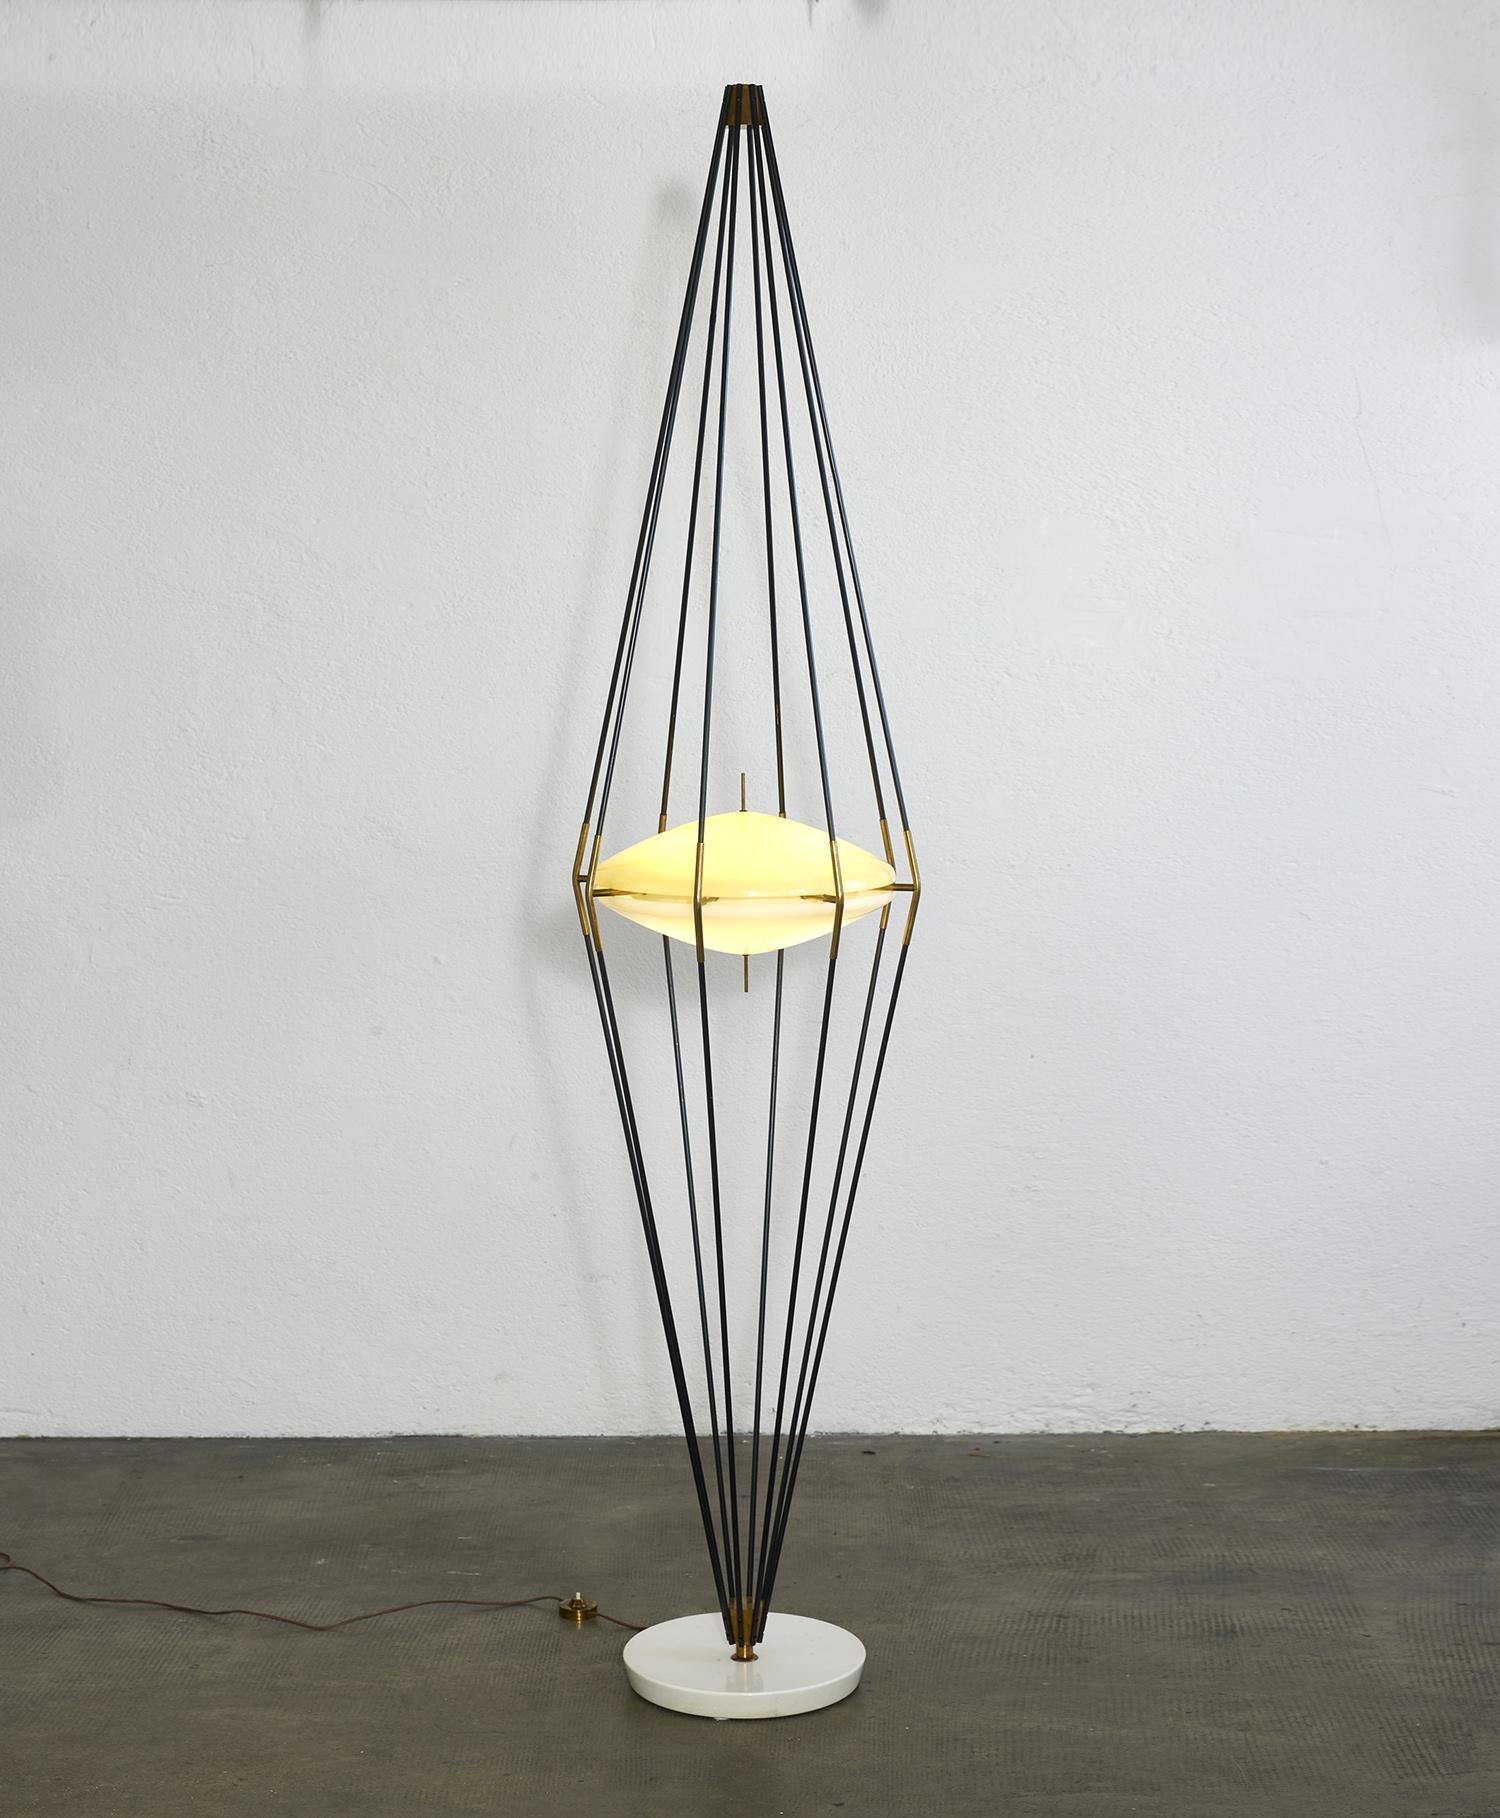 rare-model-12628-siluro-floor-lamp-by-angelo-lelii-for-arredoluce-1957-image-01